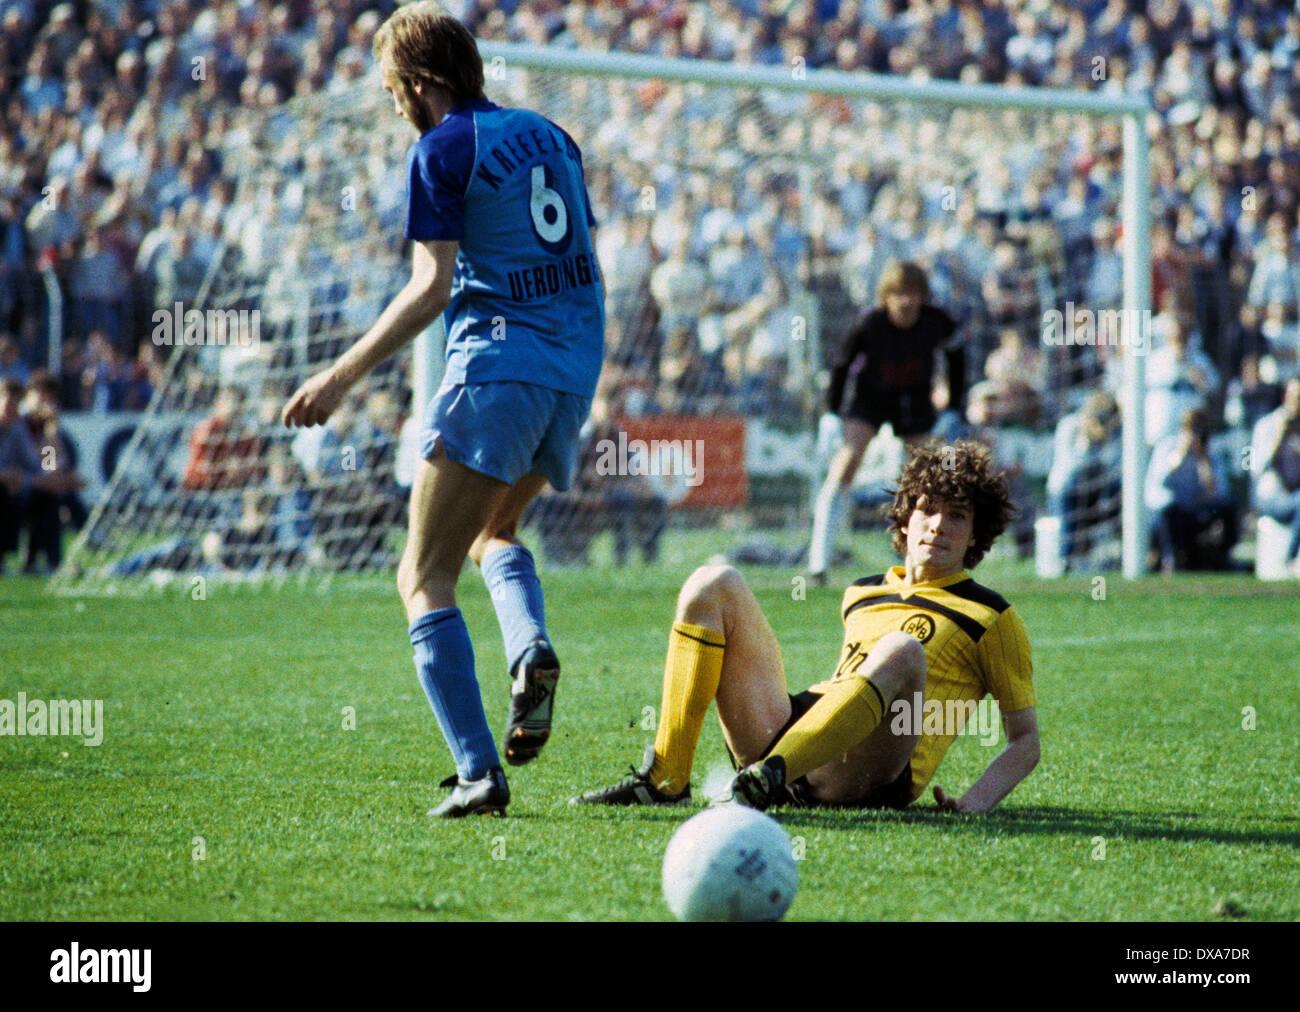 football, Bundesliga, 1983/1984, Grotenburg Stadium, FC Bayer 05 Uerdingen versus Borussia Dortmund 2:1, scene of the match, duel, Werner Buttgereit (Bayer) left and Michael Zorc (BVB) - Stock Image